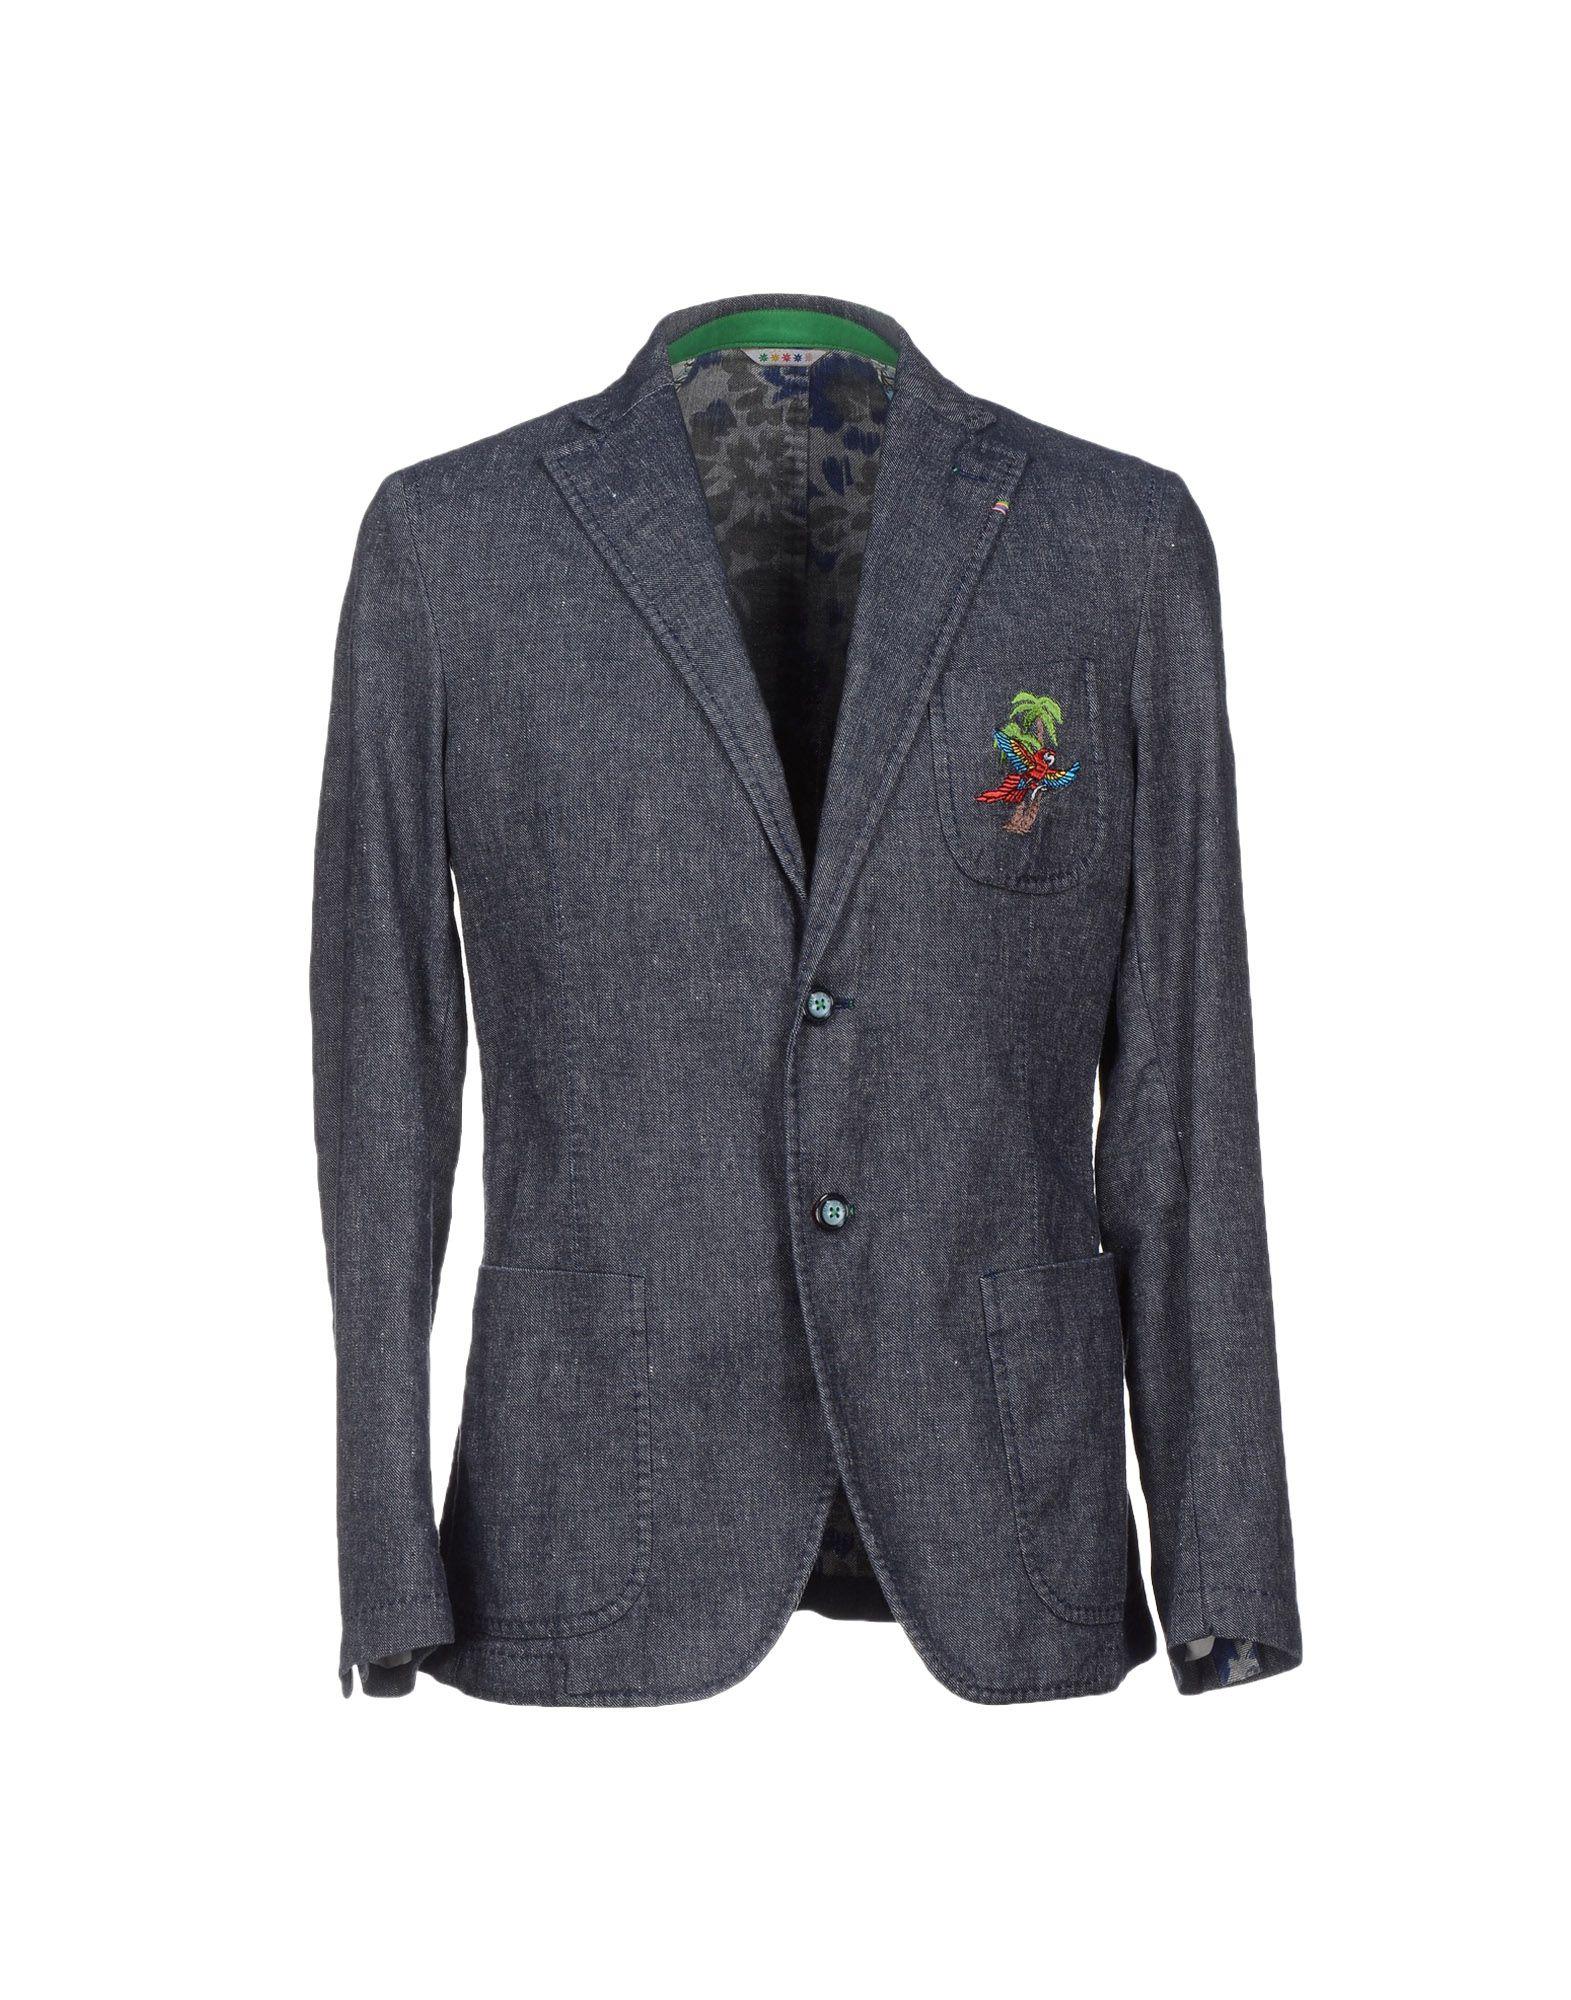 Manuel Ritz Denim Outerwear